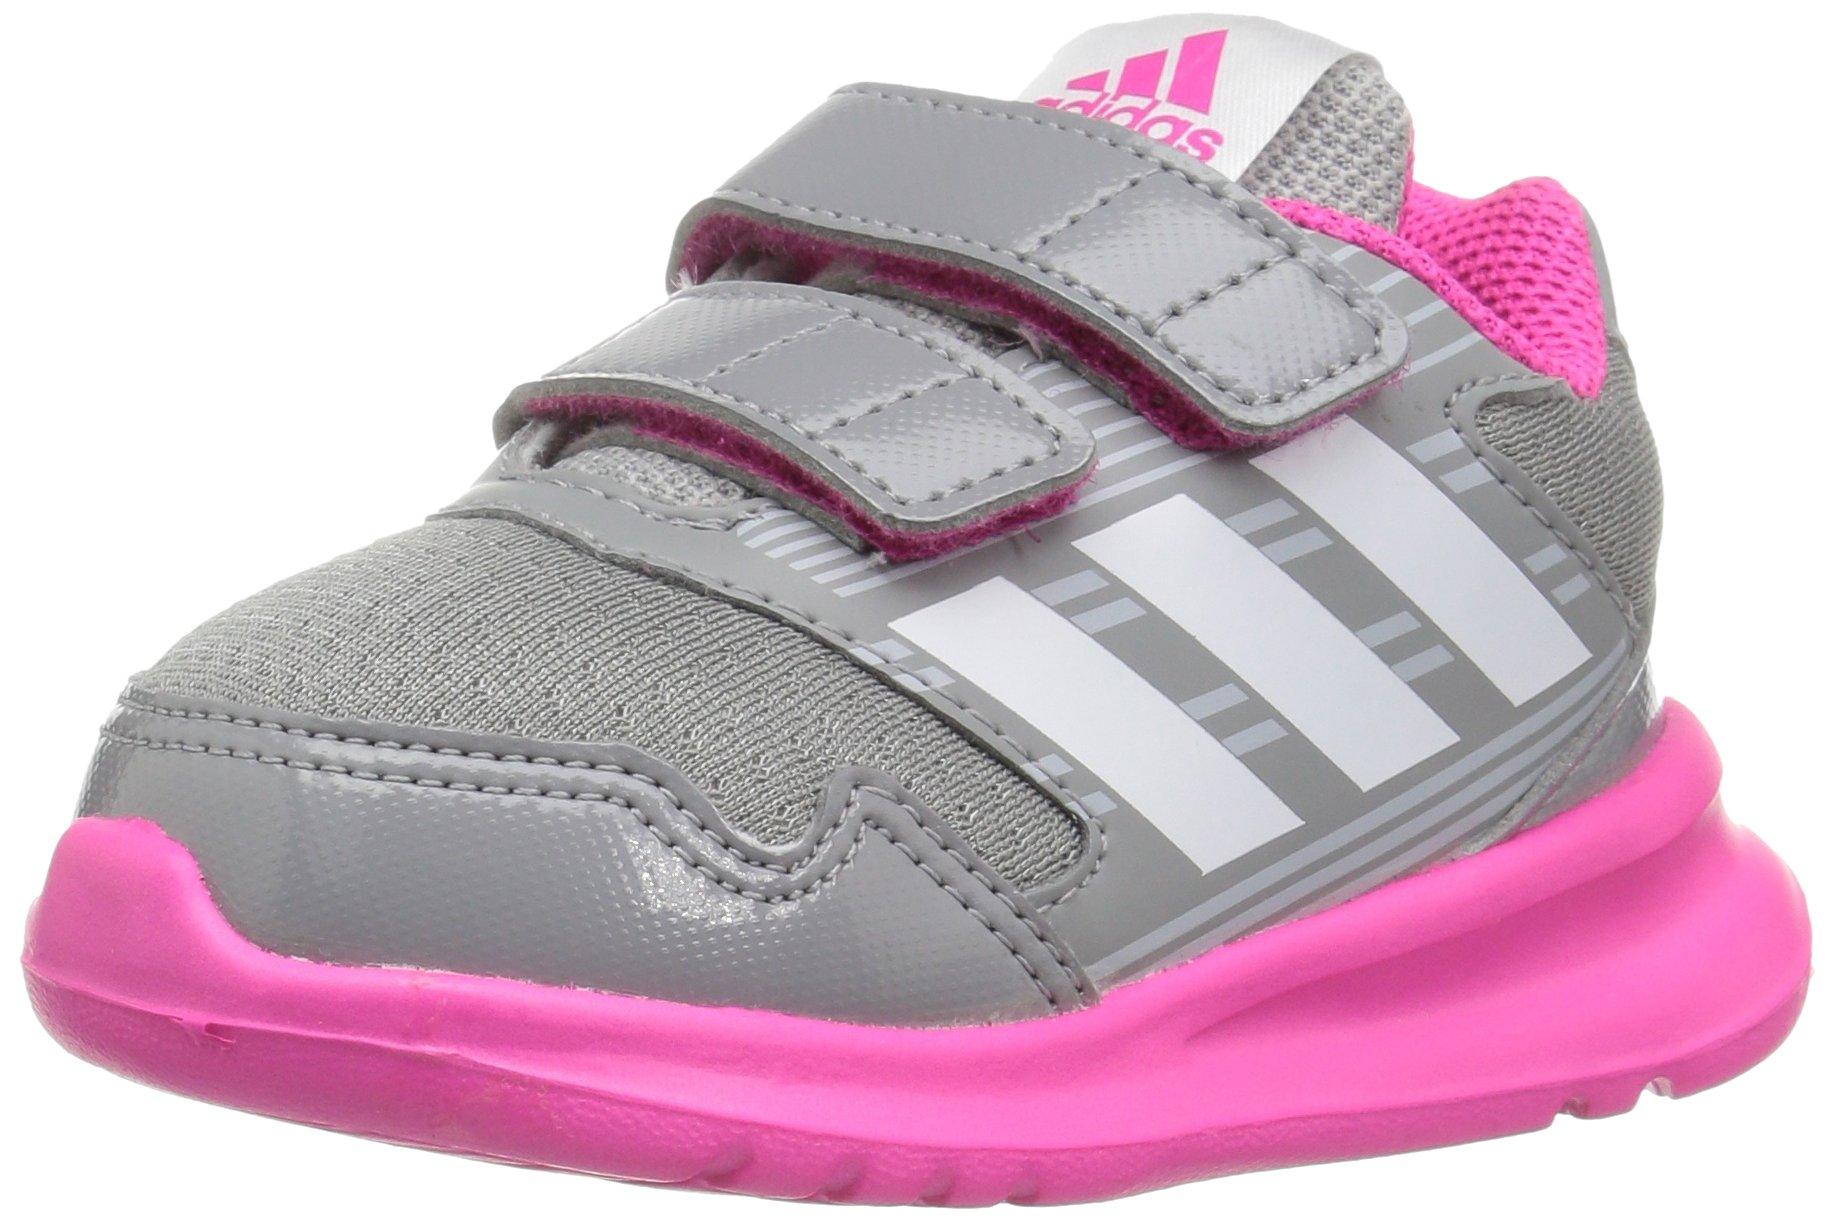 buy popular e1de3 d969c Galleon - Adidas Performance Girls  Altarun CF I Sneaker, Mid  Grey White Shock Pink, 9.5 M US Toddler